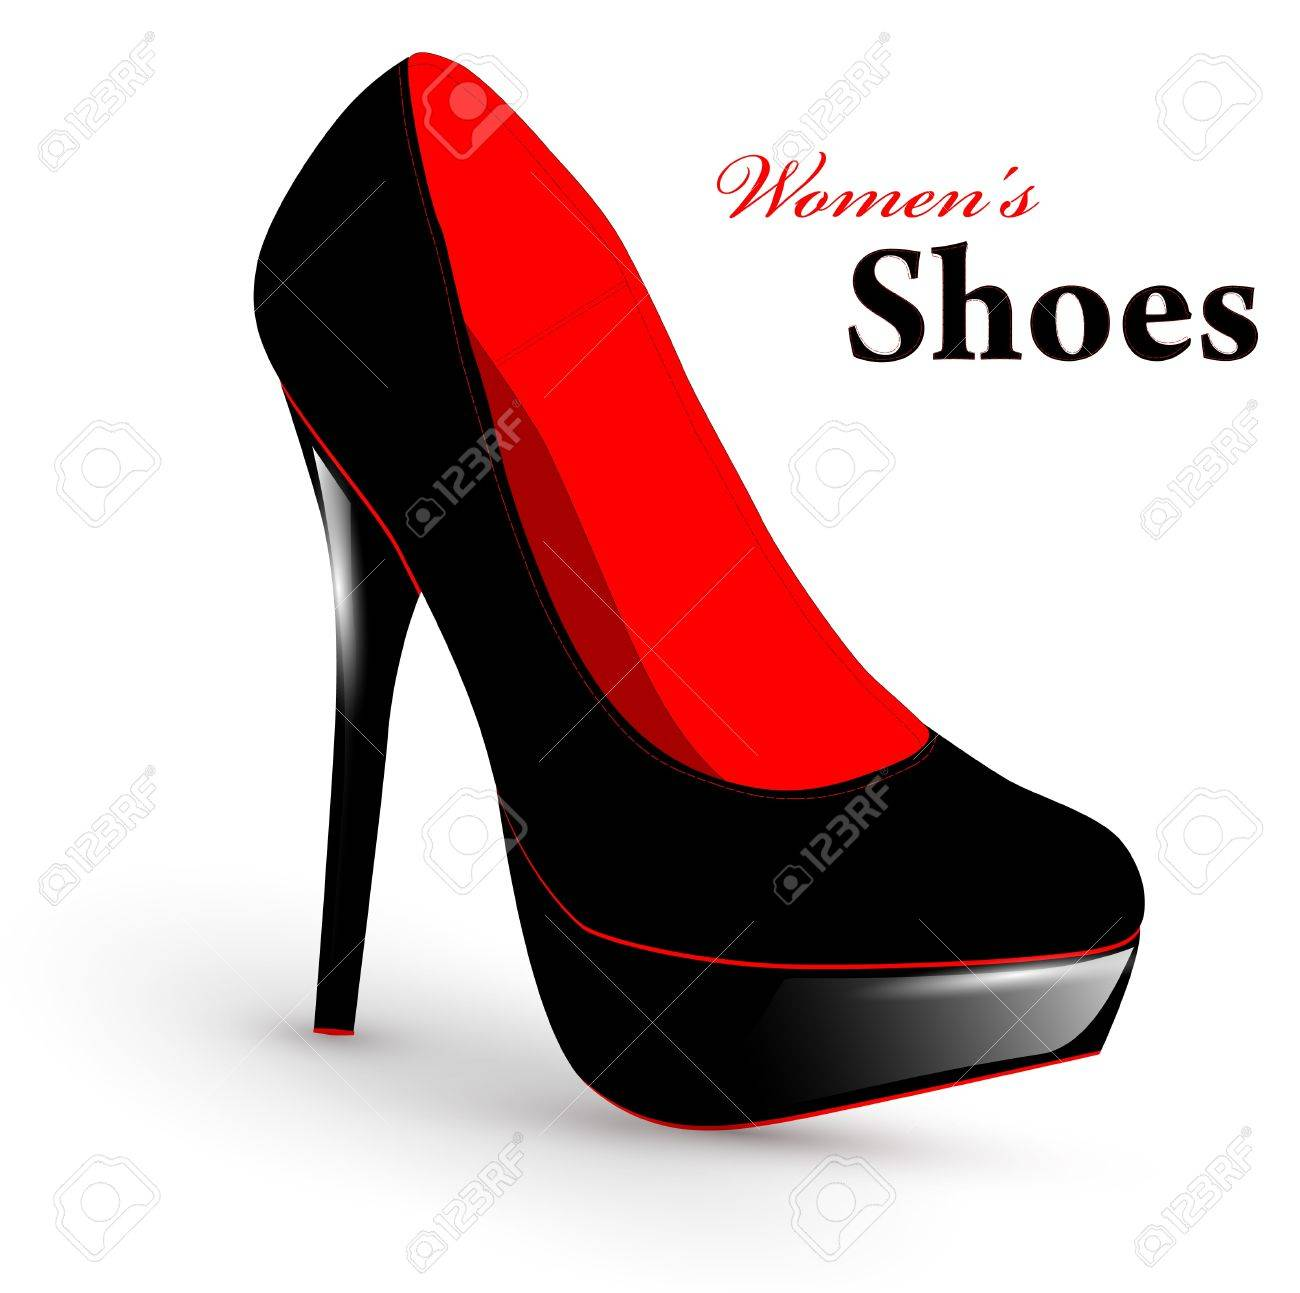 Illustration of fashion high heel woman single shoe - 9505877